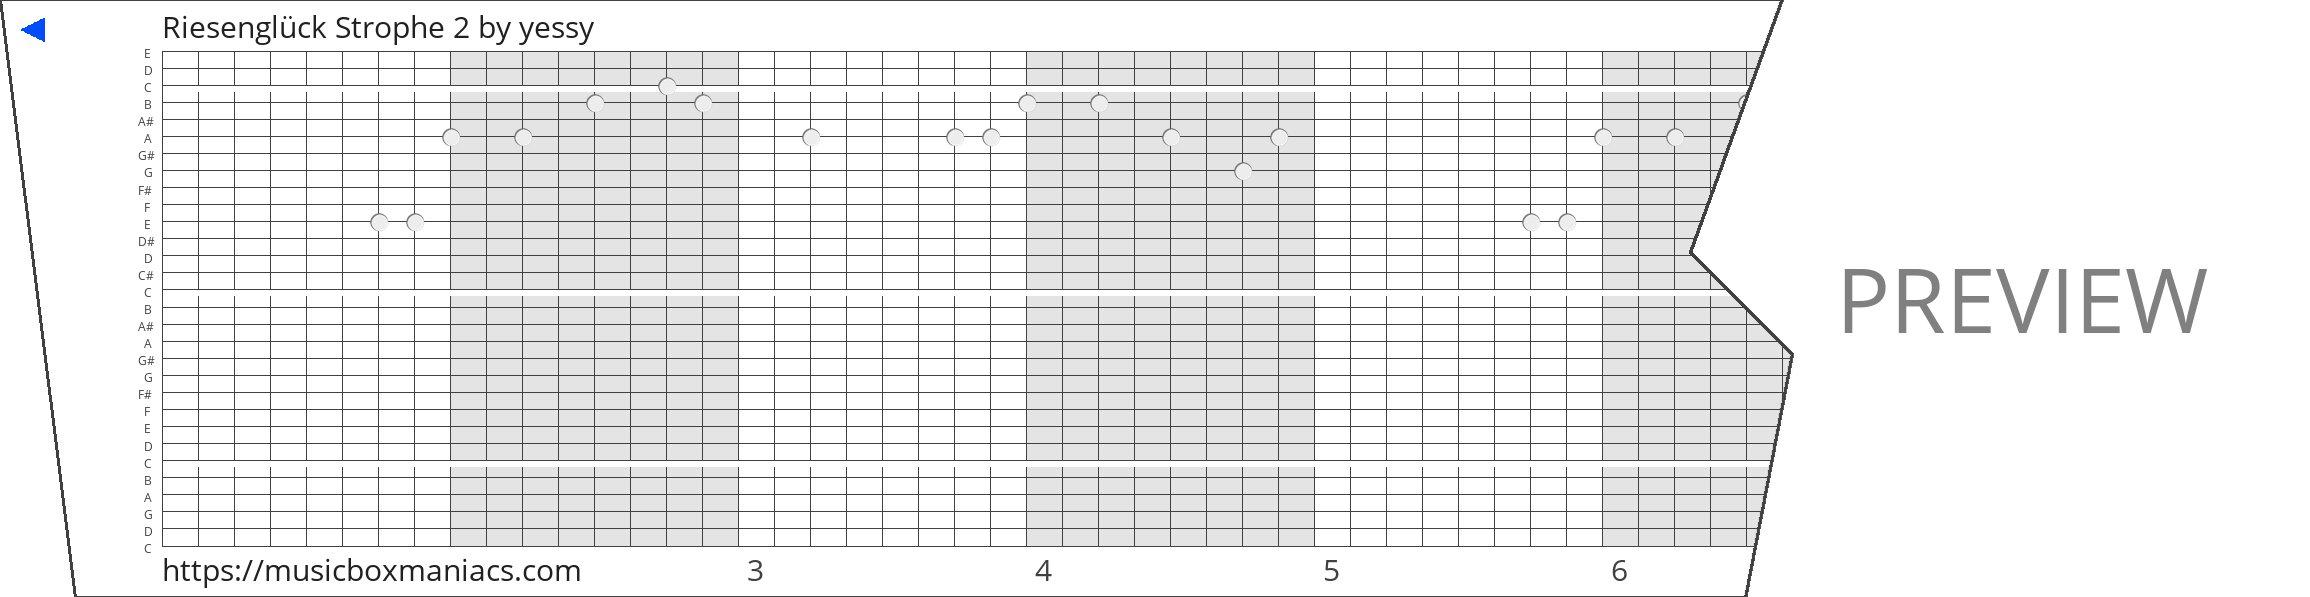 Riesenglück Strophe 2 30 note music box paper strip